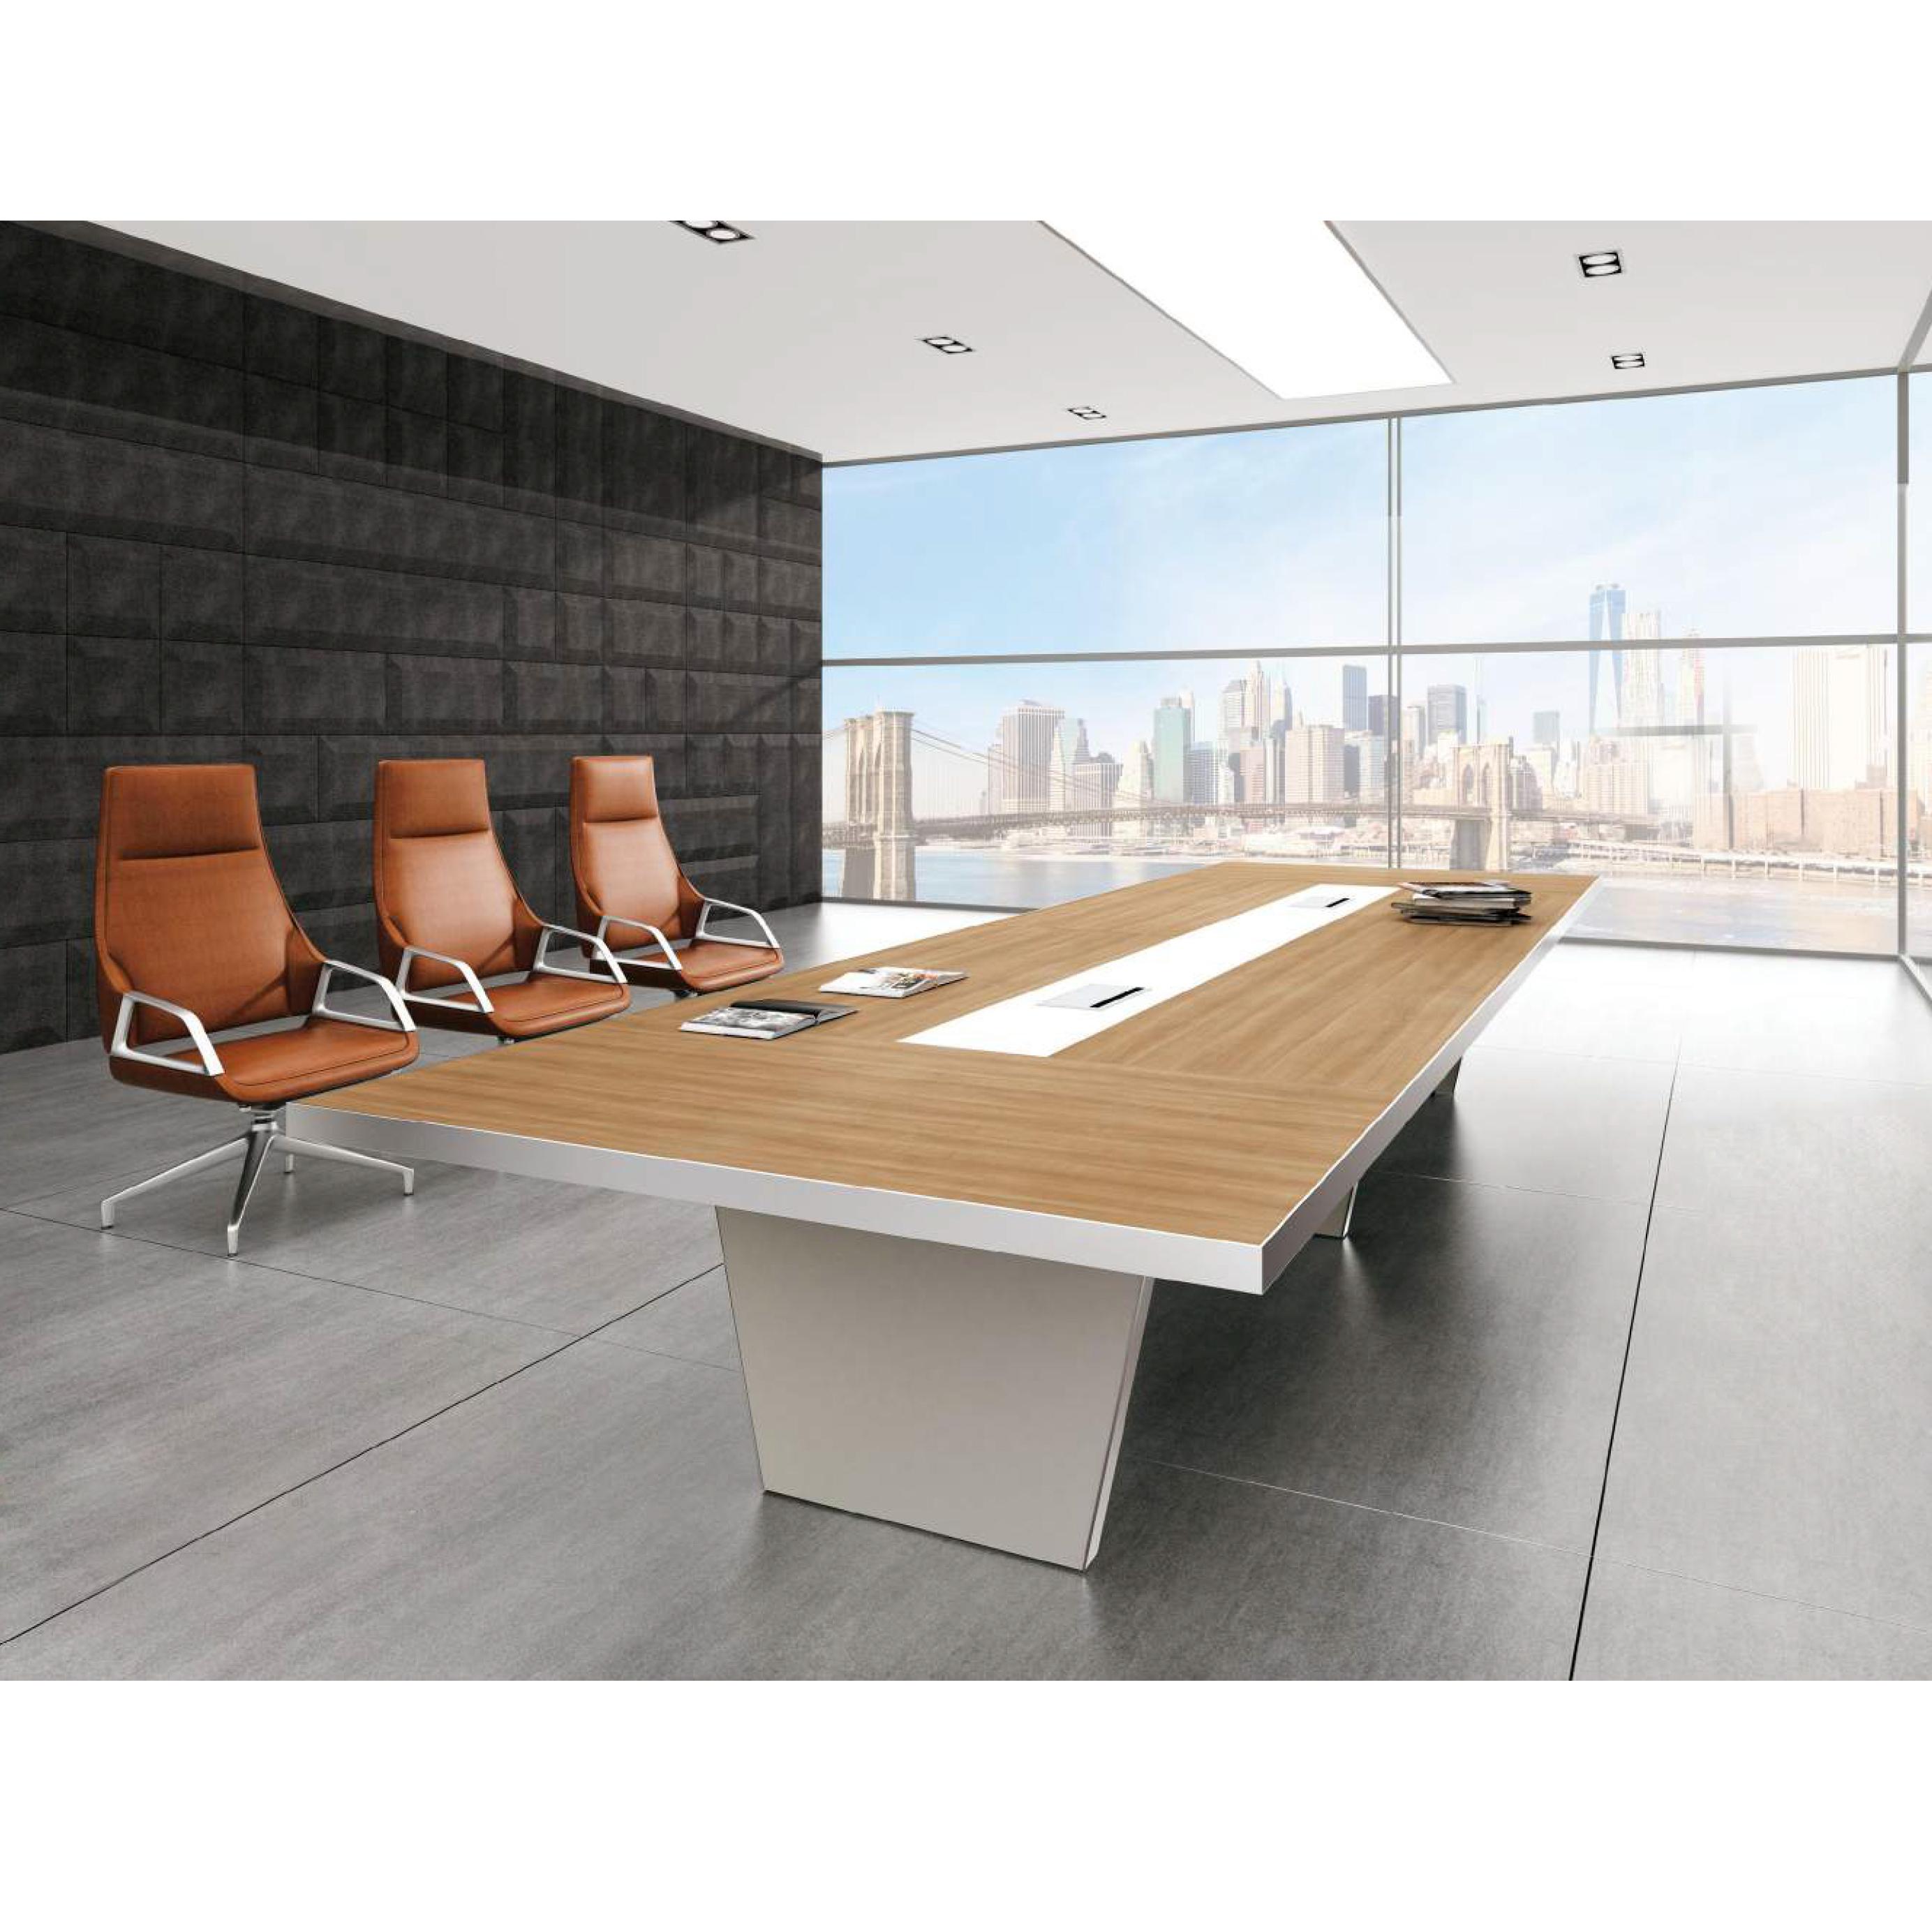 Cina Industri Modern Meja Perabot Kamar Kantor Modern Meja Meeting